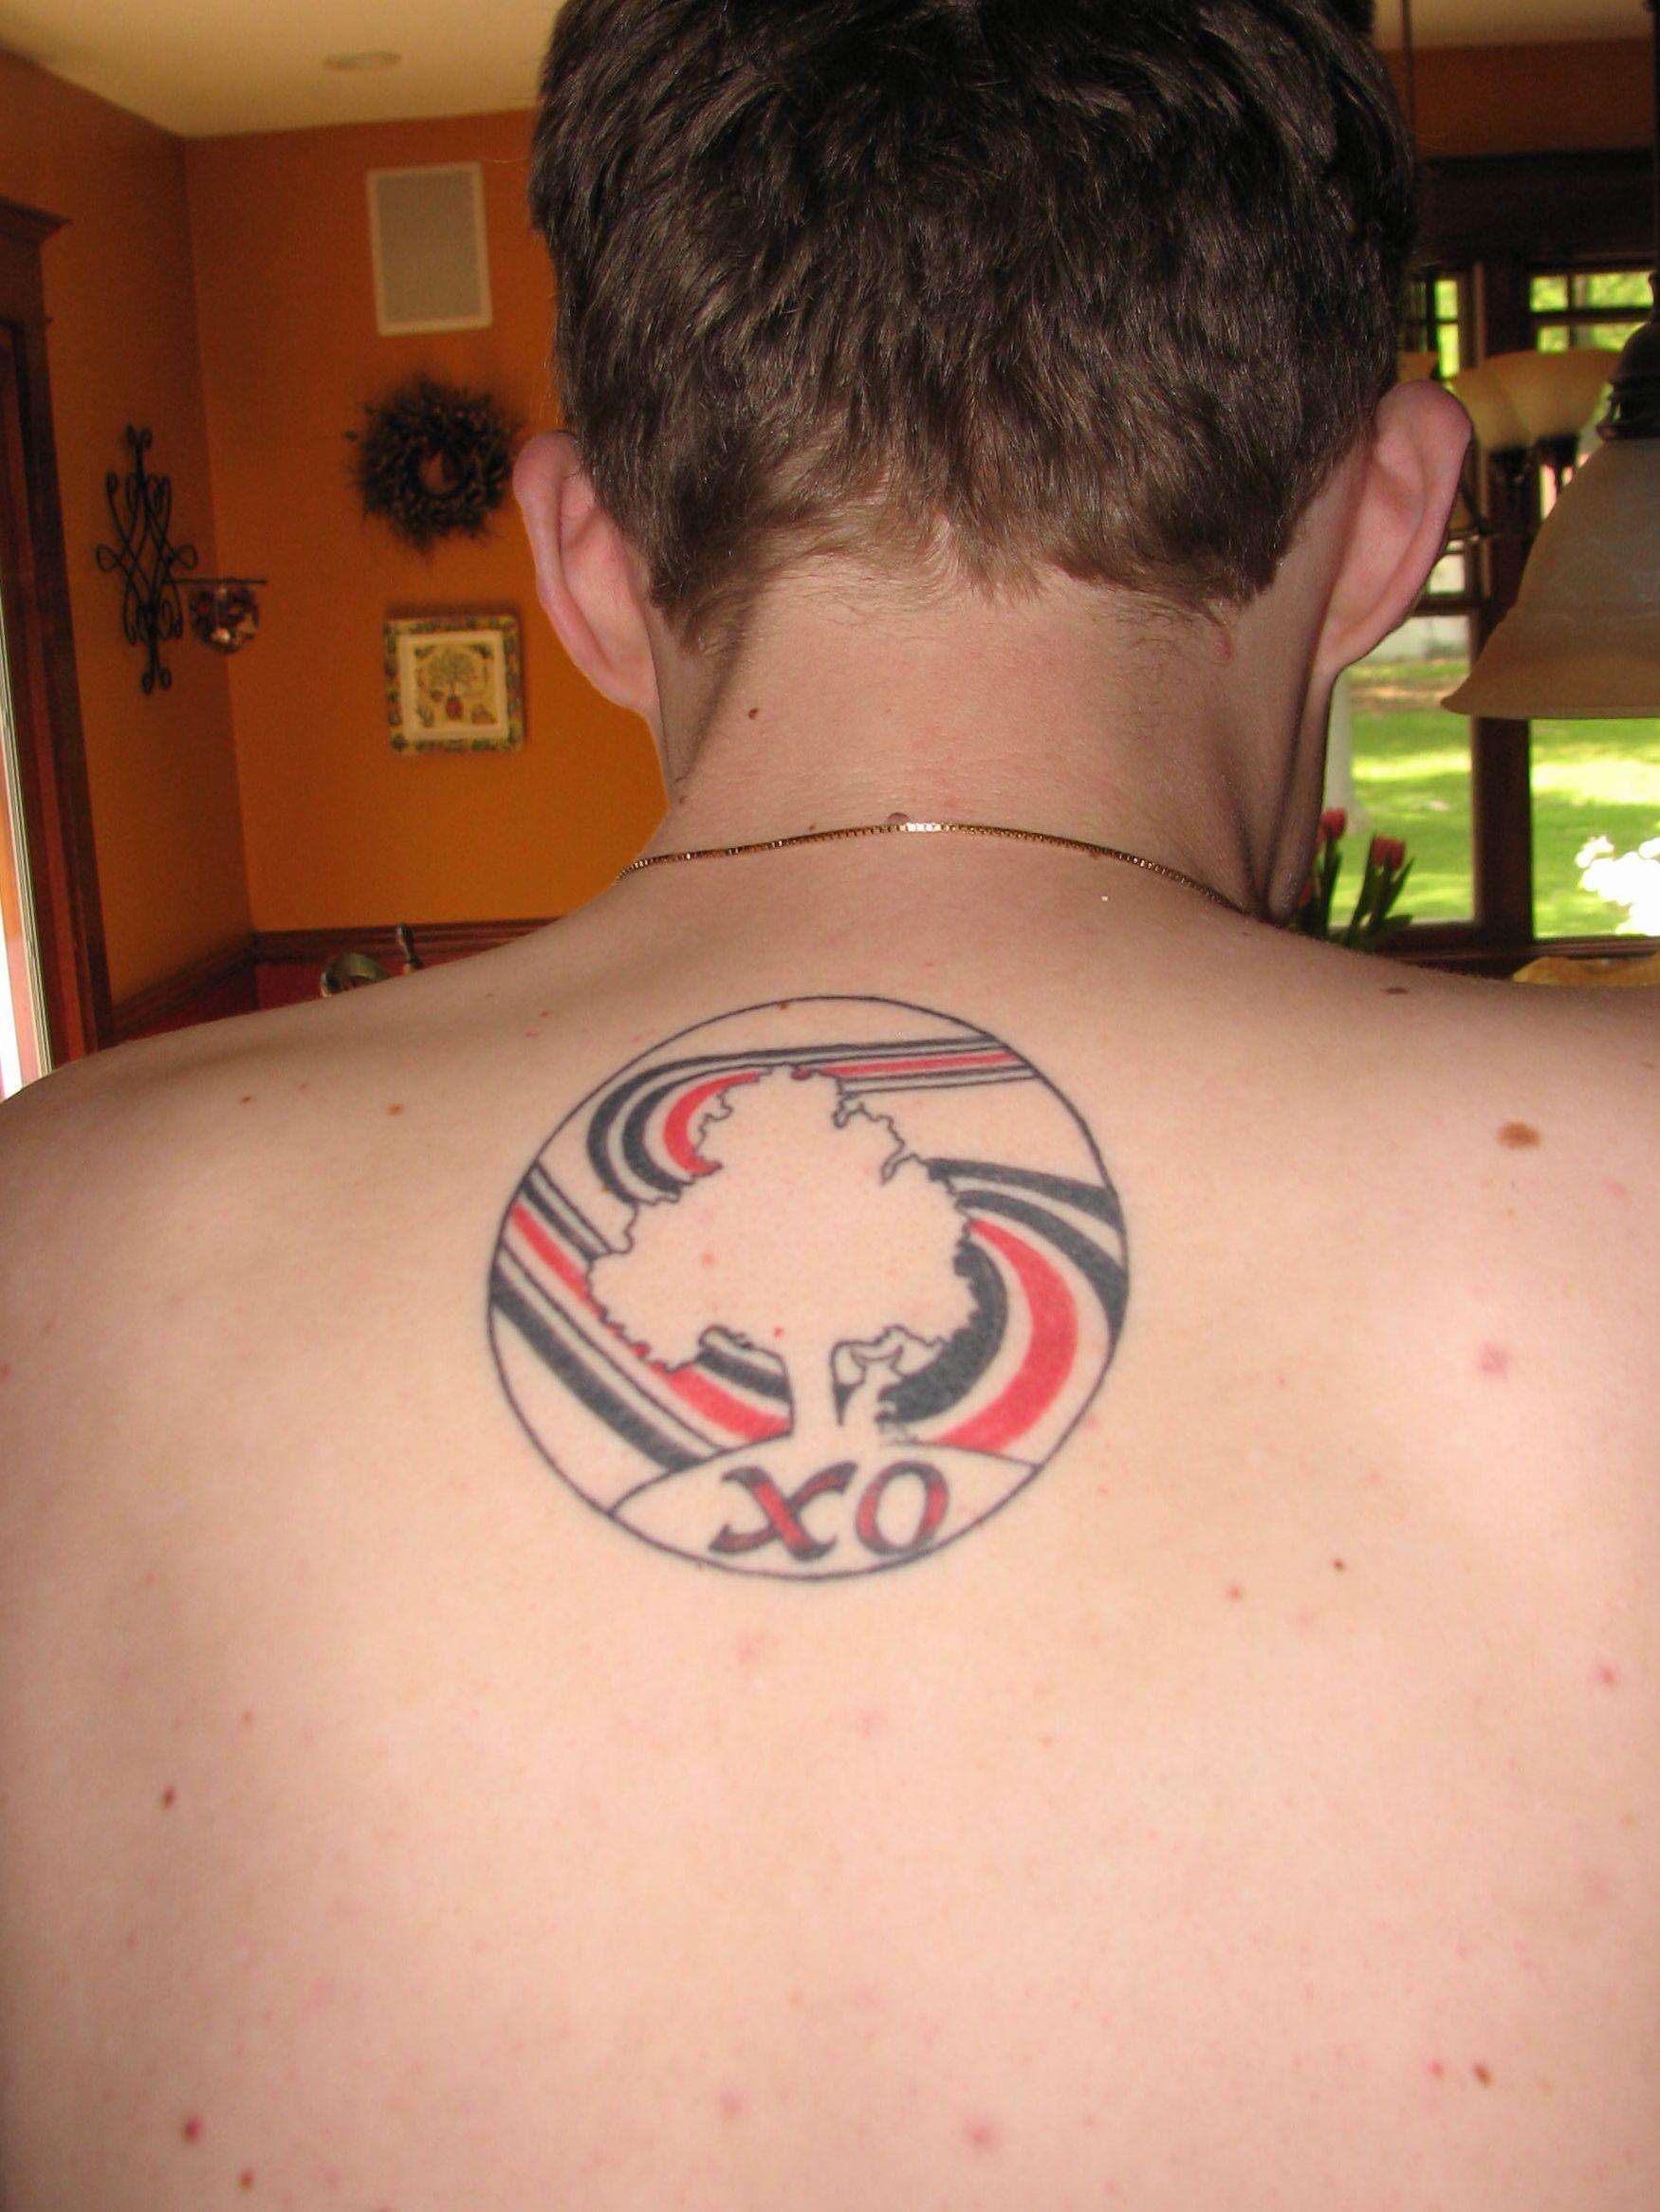 Elliott Smith Tattoo : elliott, smith, tattoo, Tattoo, Elliott, Smith, Ferdinand, Tattoos,, Tats,